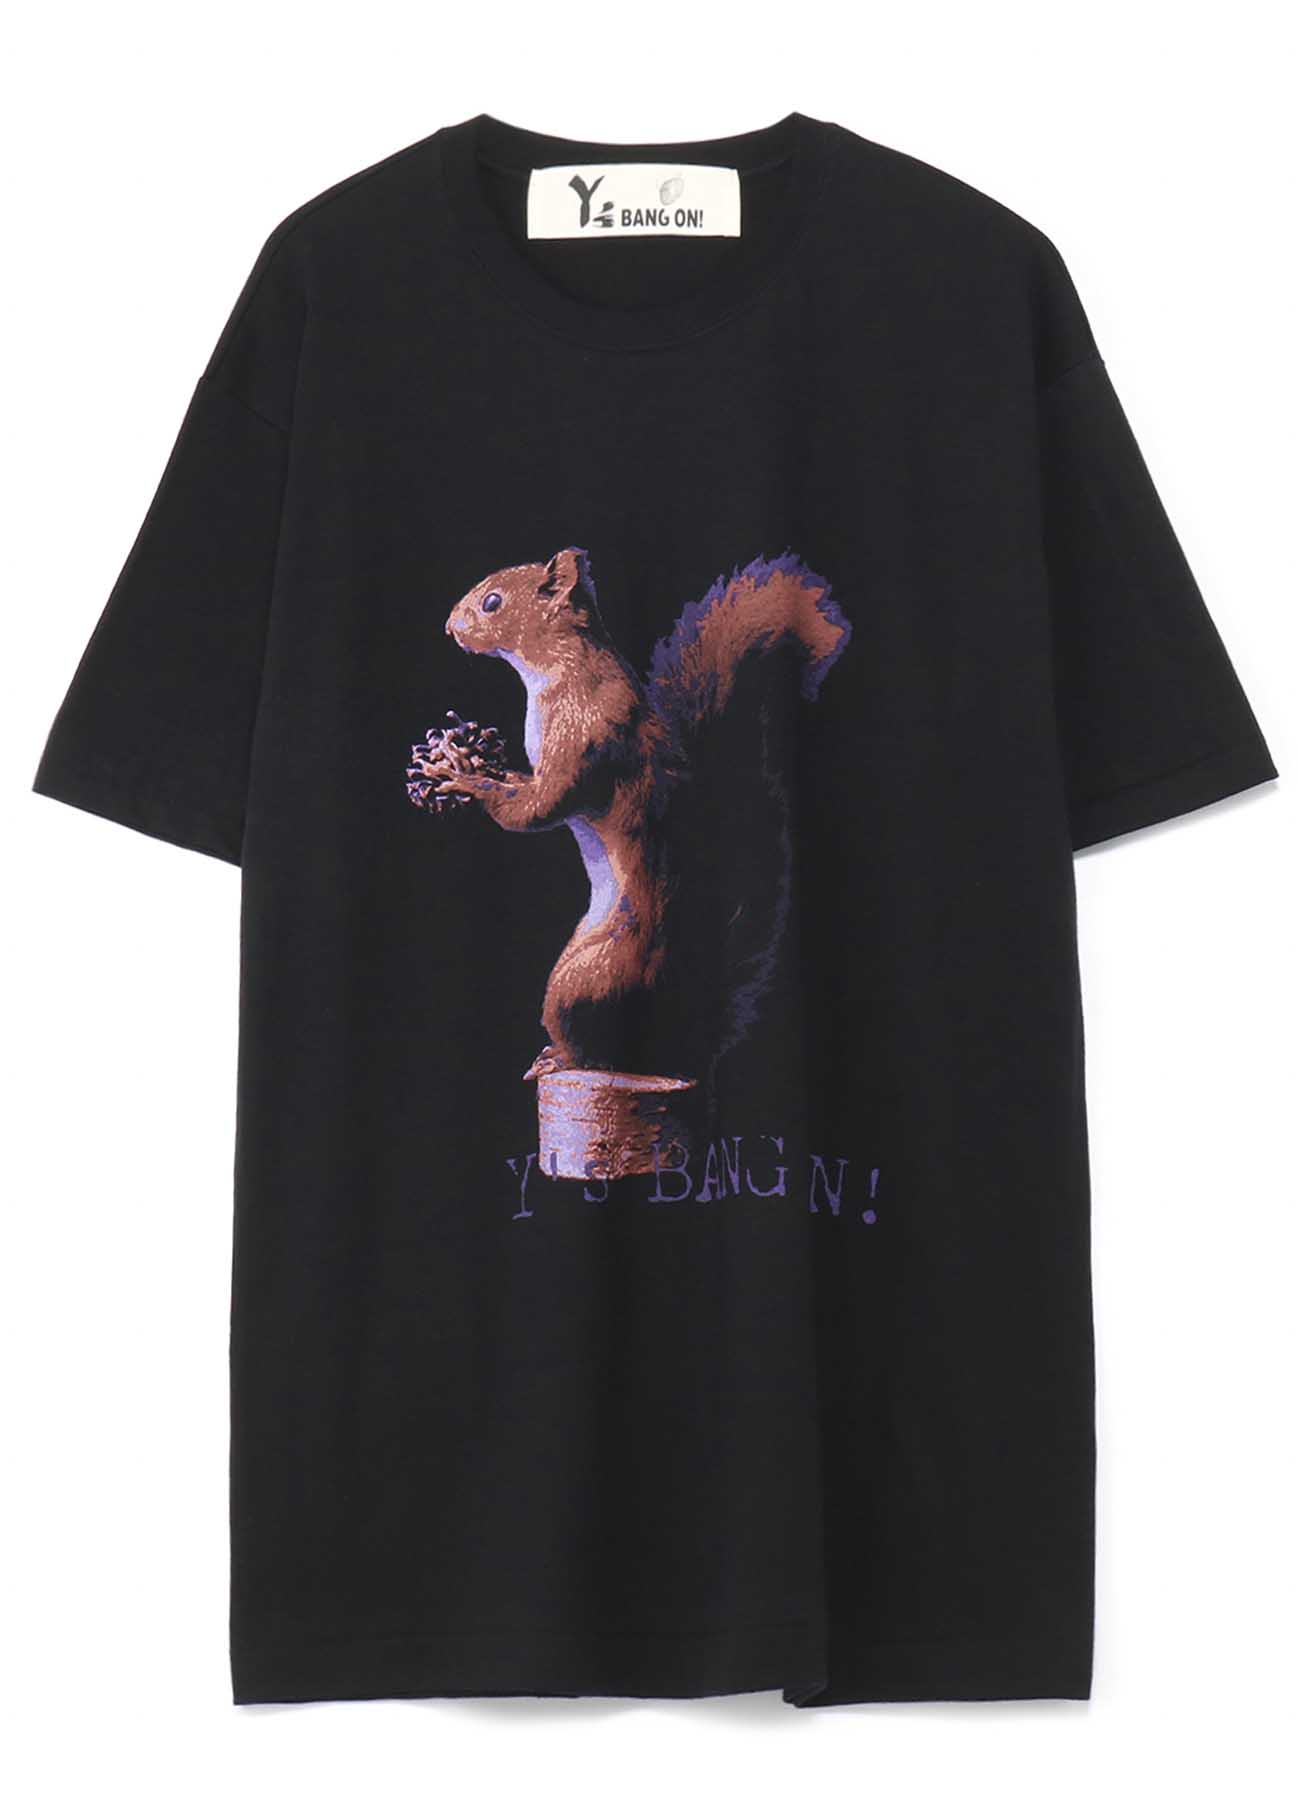 Y's BANG ON!Squirrel Tshirt